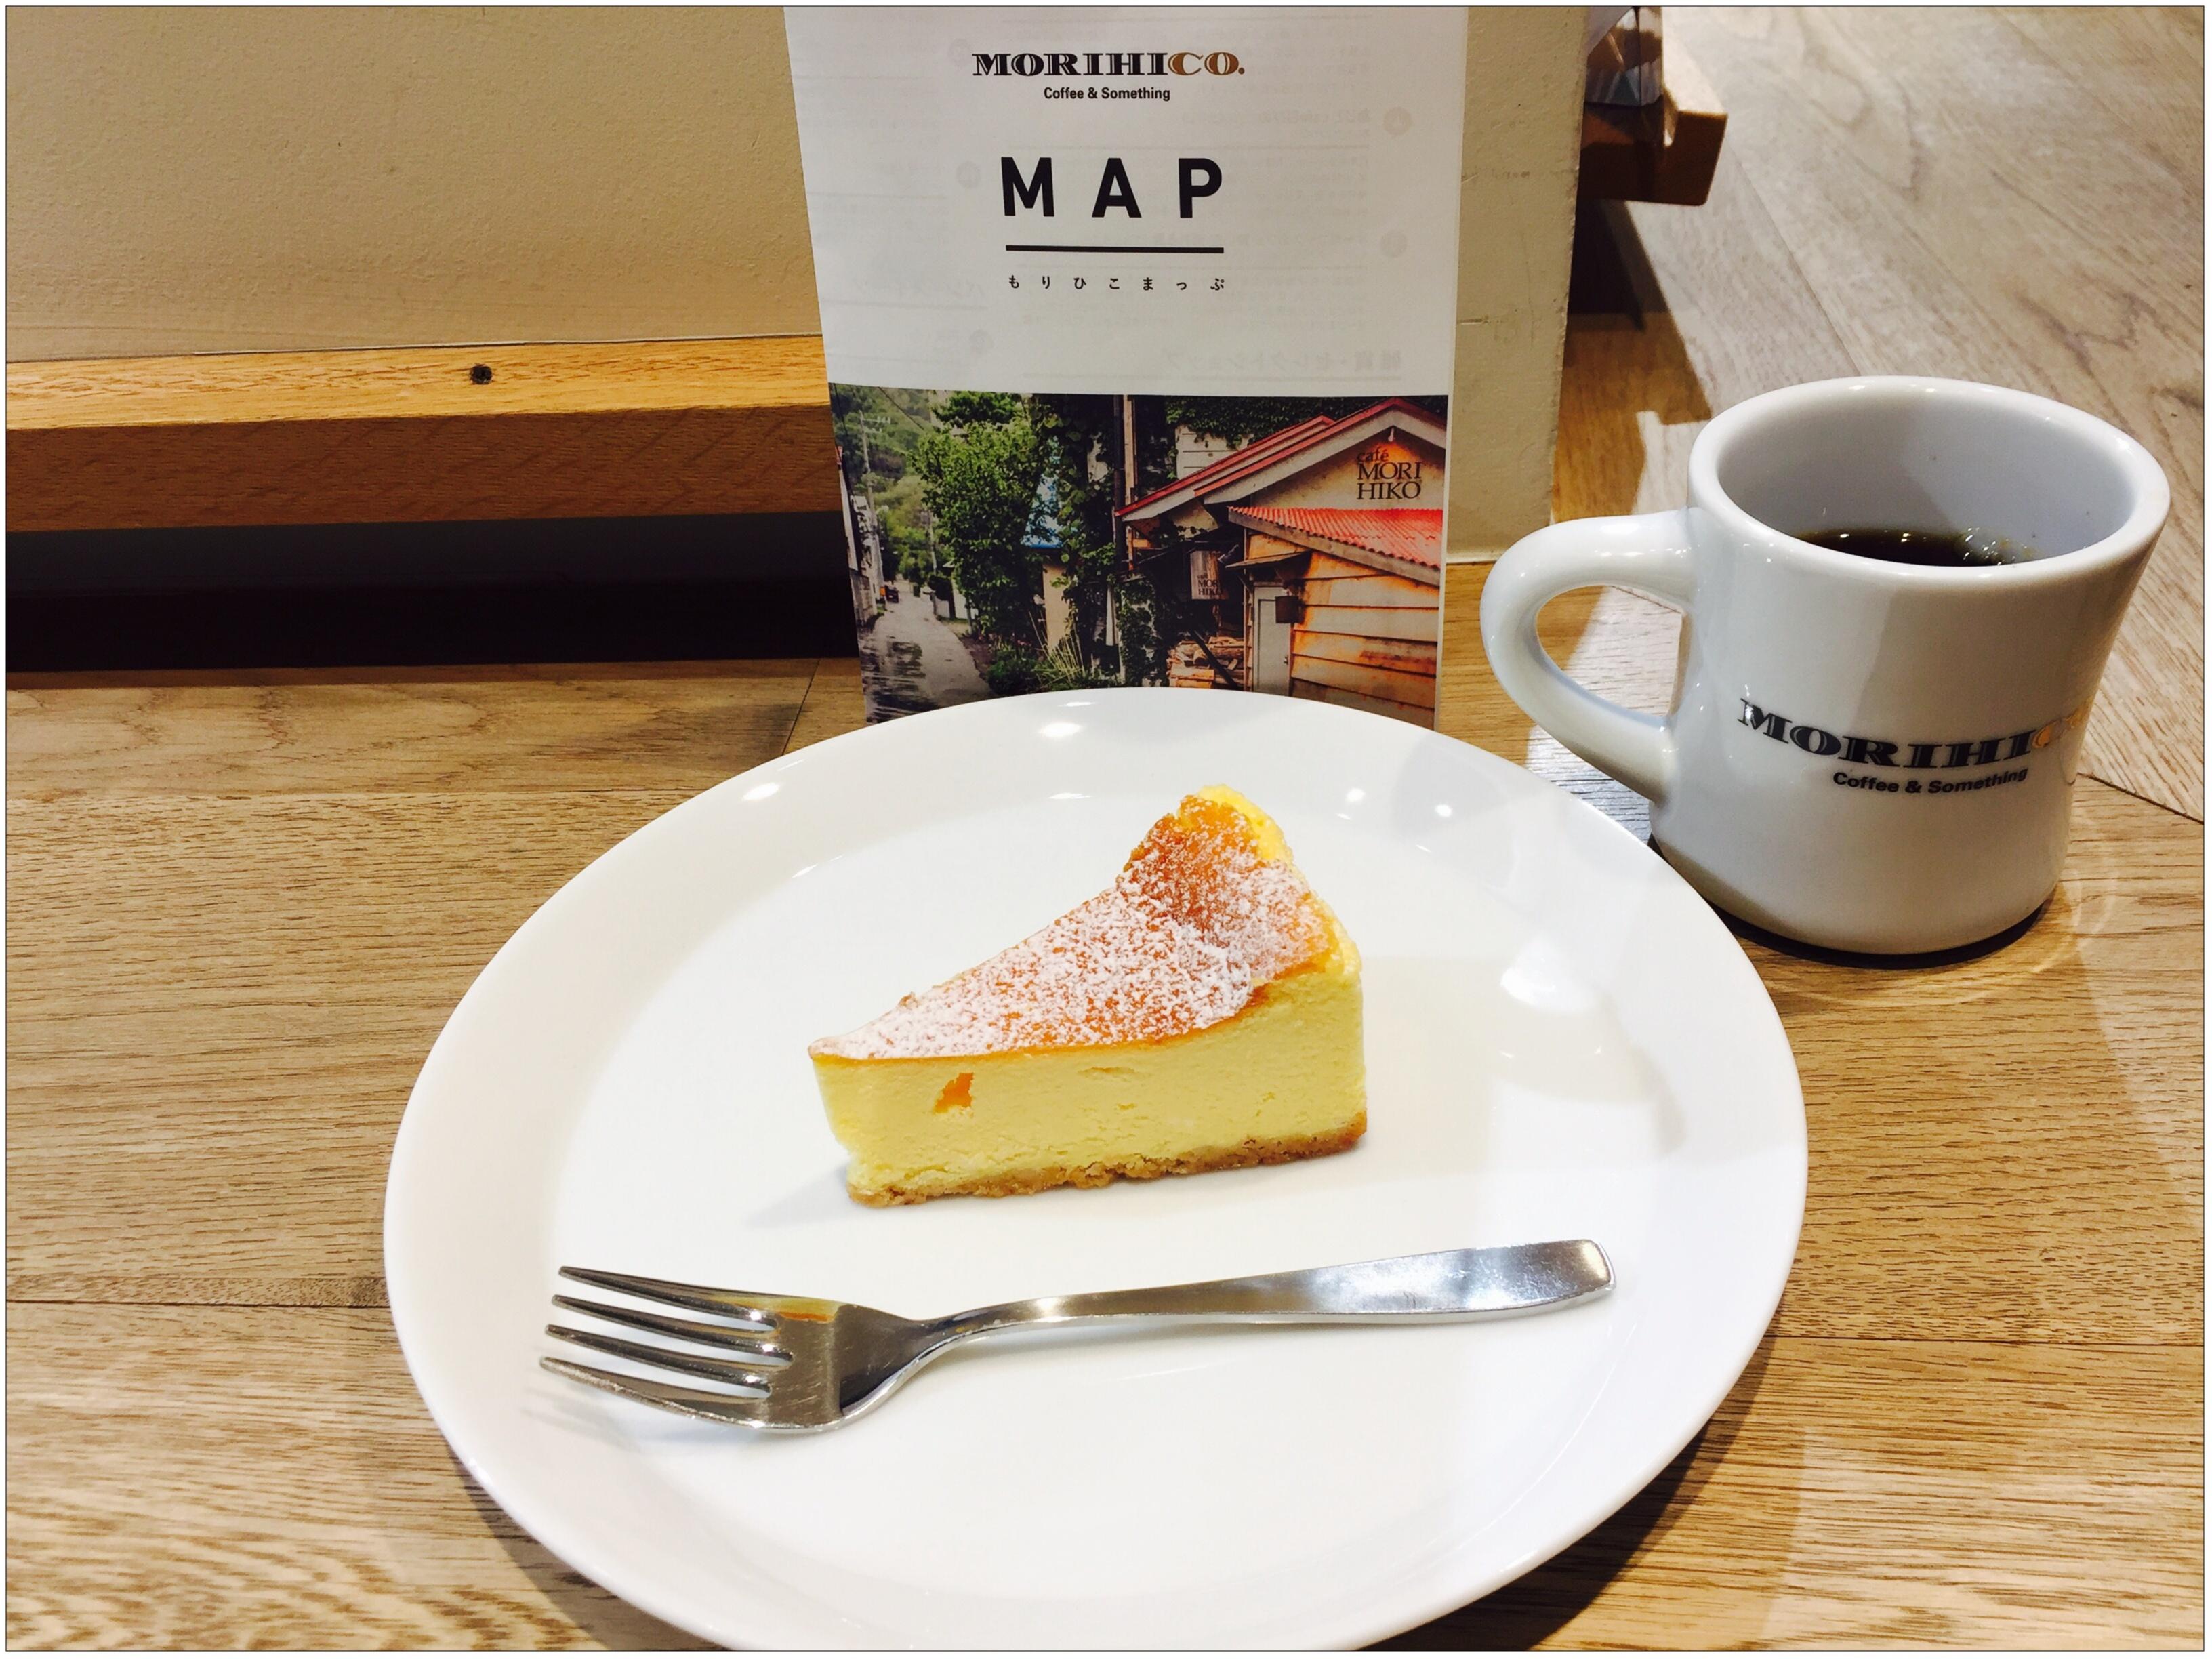 …ஐ コーヒー好きさんは急いで!札幌にしか出店していない【MORIHICO COFFEE & SOMETHING】が期間限定で東京にオープン♥️ஐ¨_2